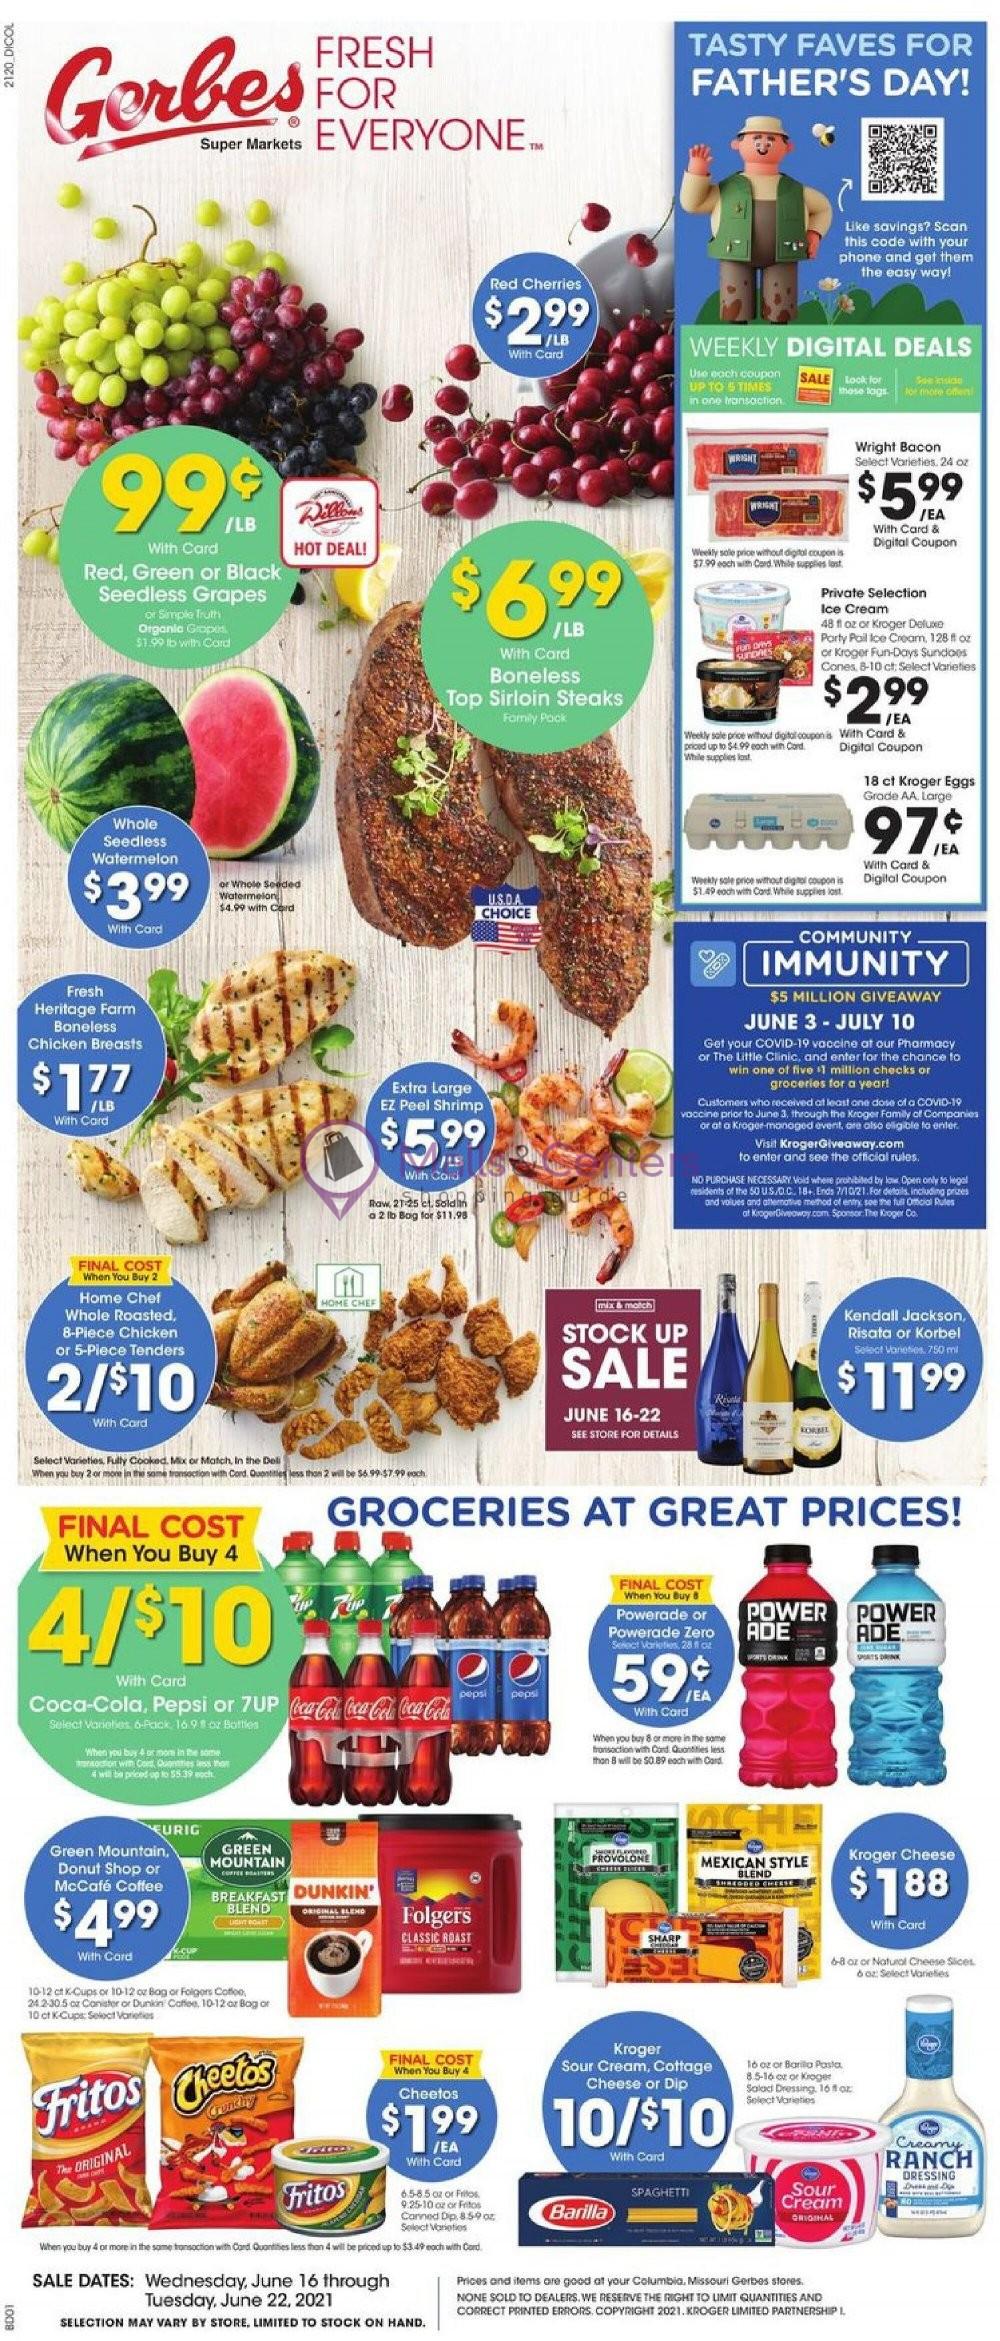 weekly ads Gerbes Super Markets - page 1 - mallscenters.com